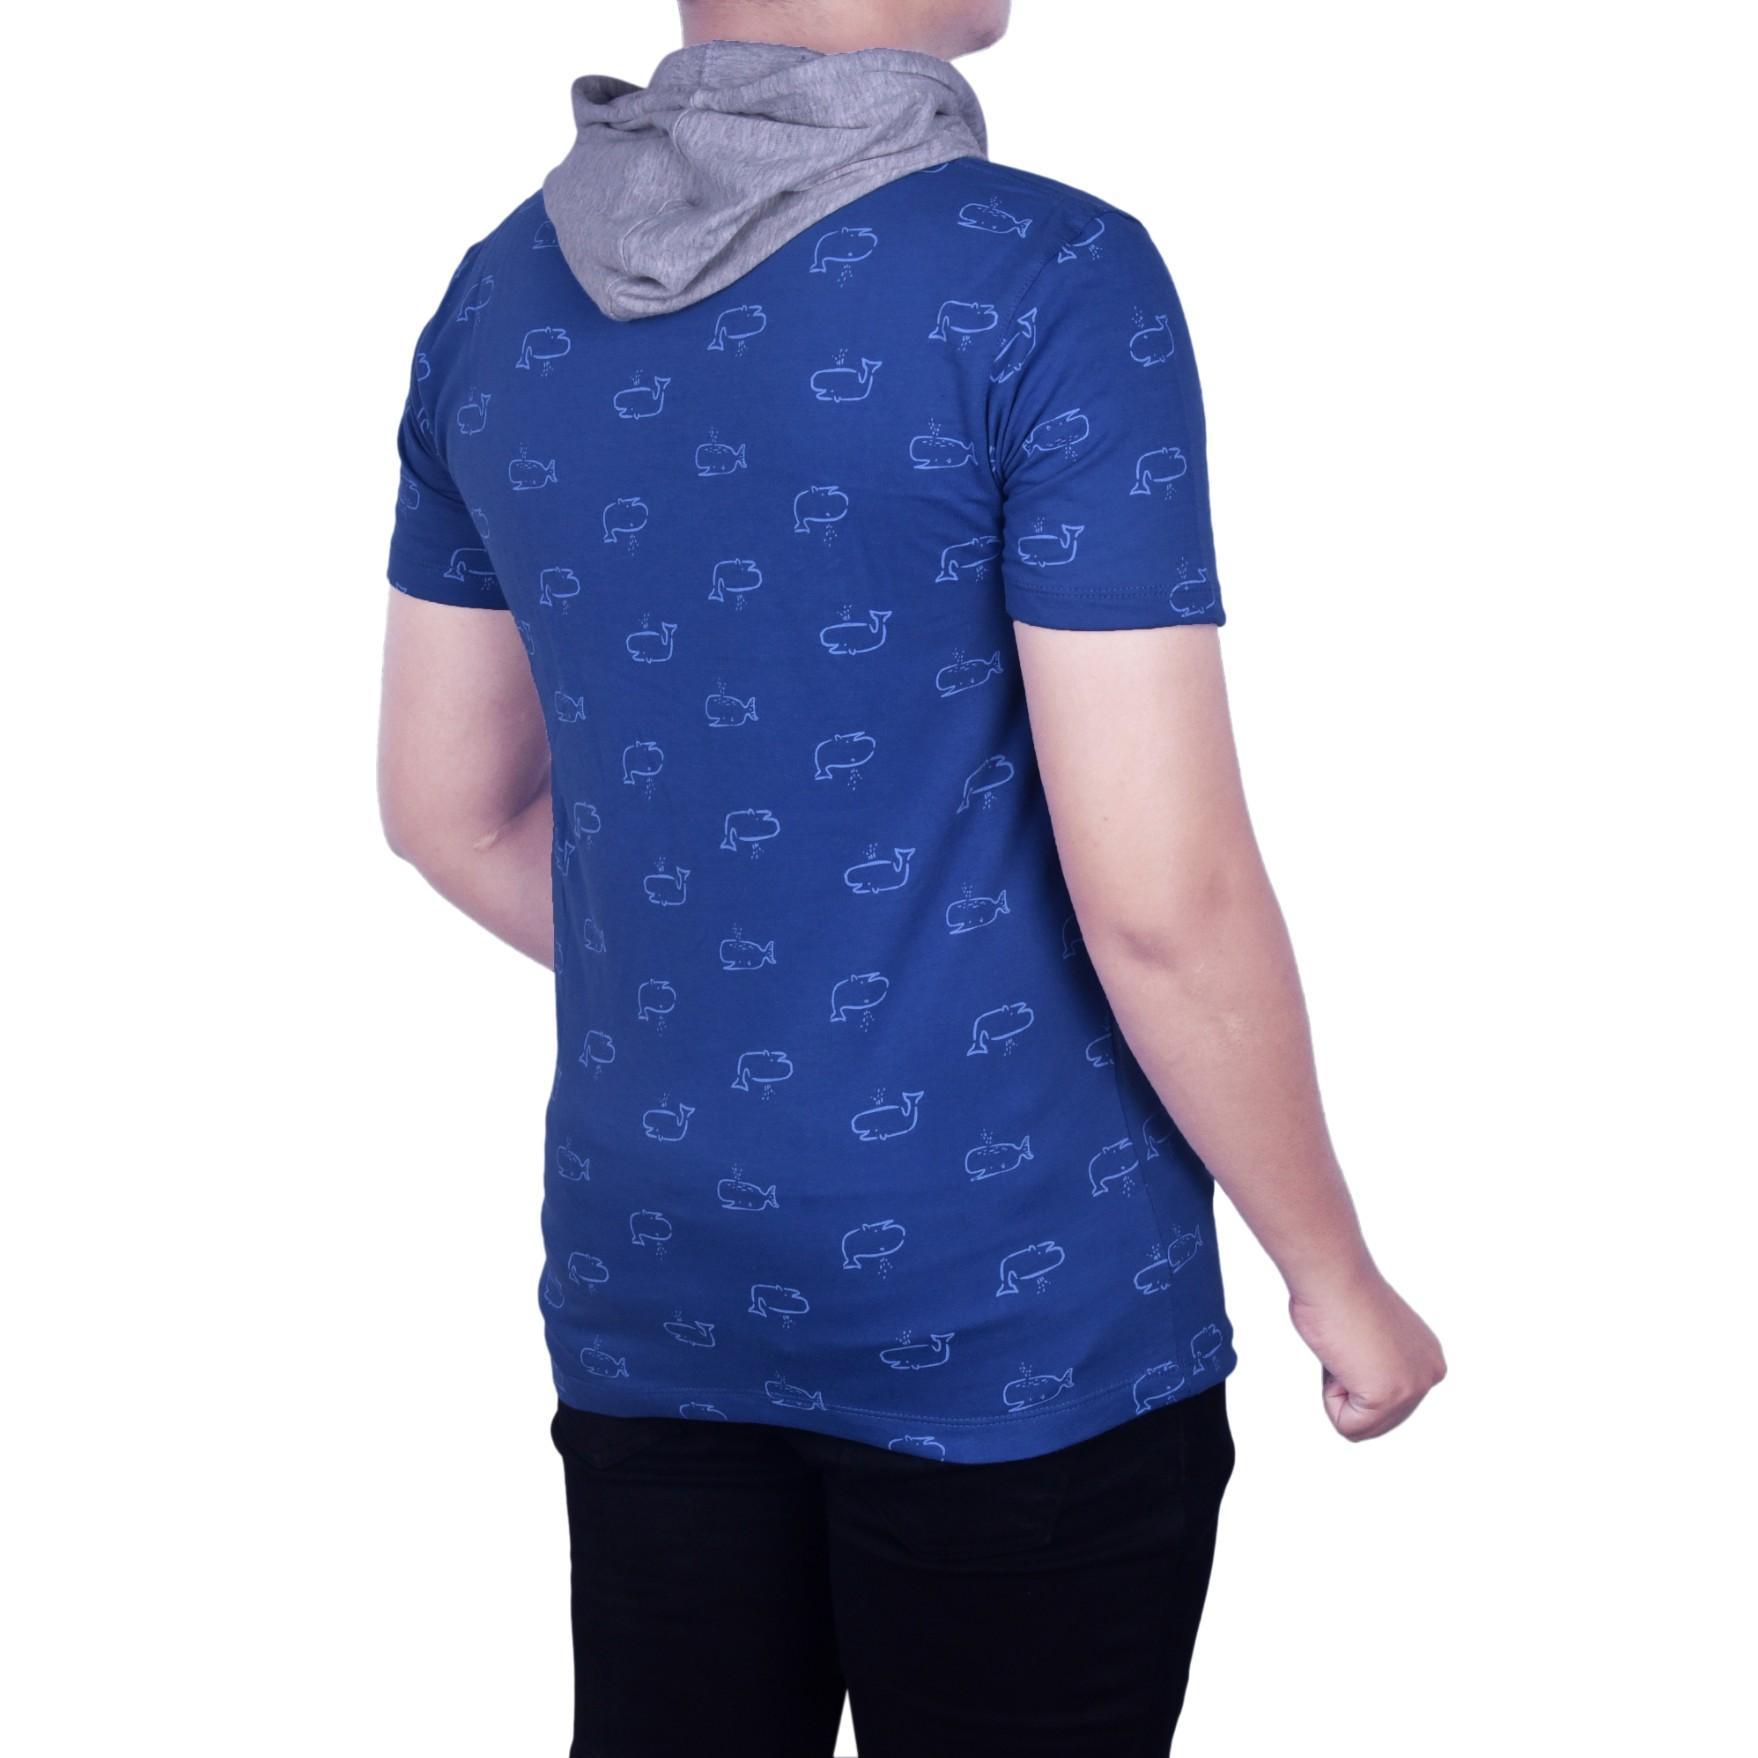 Dgm Fashion1 Baju Kaos DIstro Pakai Hoodie Casual Murah  Kaos Distro Kaos . 0439377610